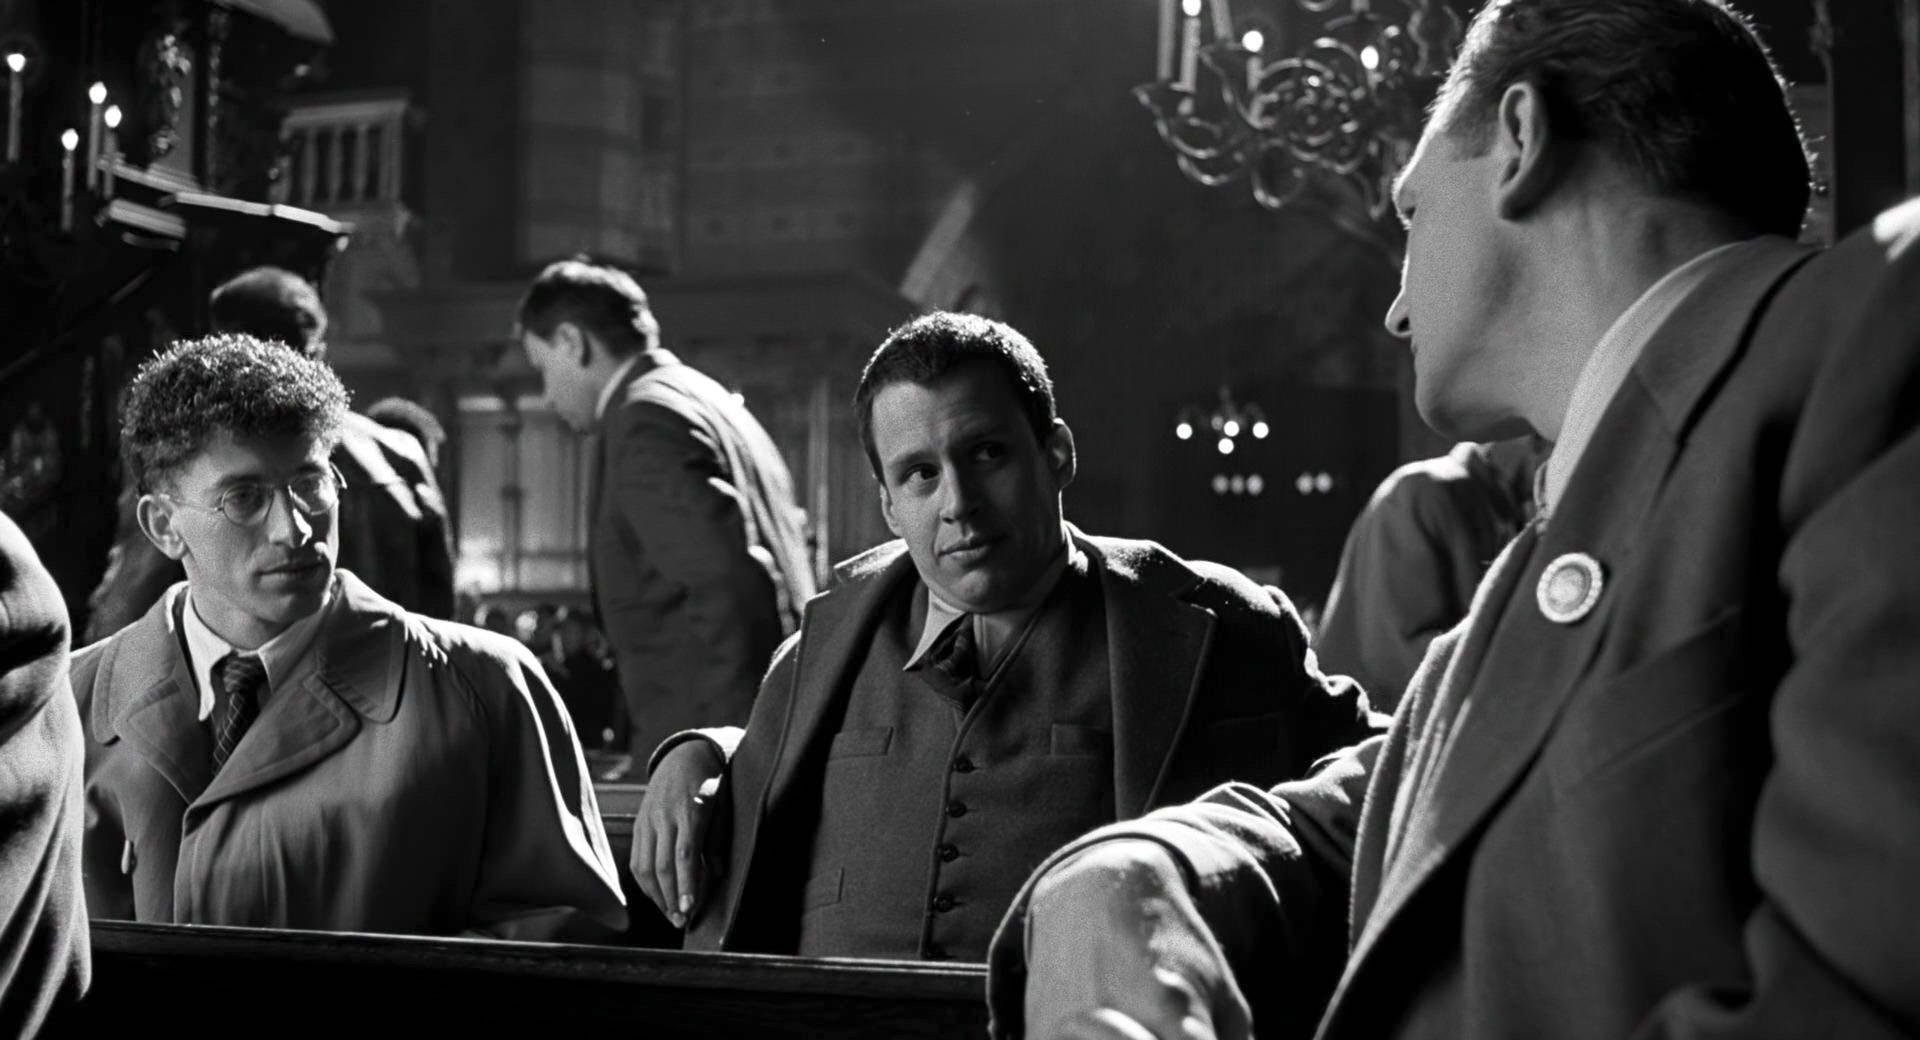 Liam Neeson, Mark Ivanir, and Jonathan Sagall in Schindler's List (1993)